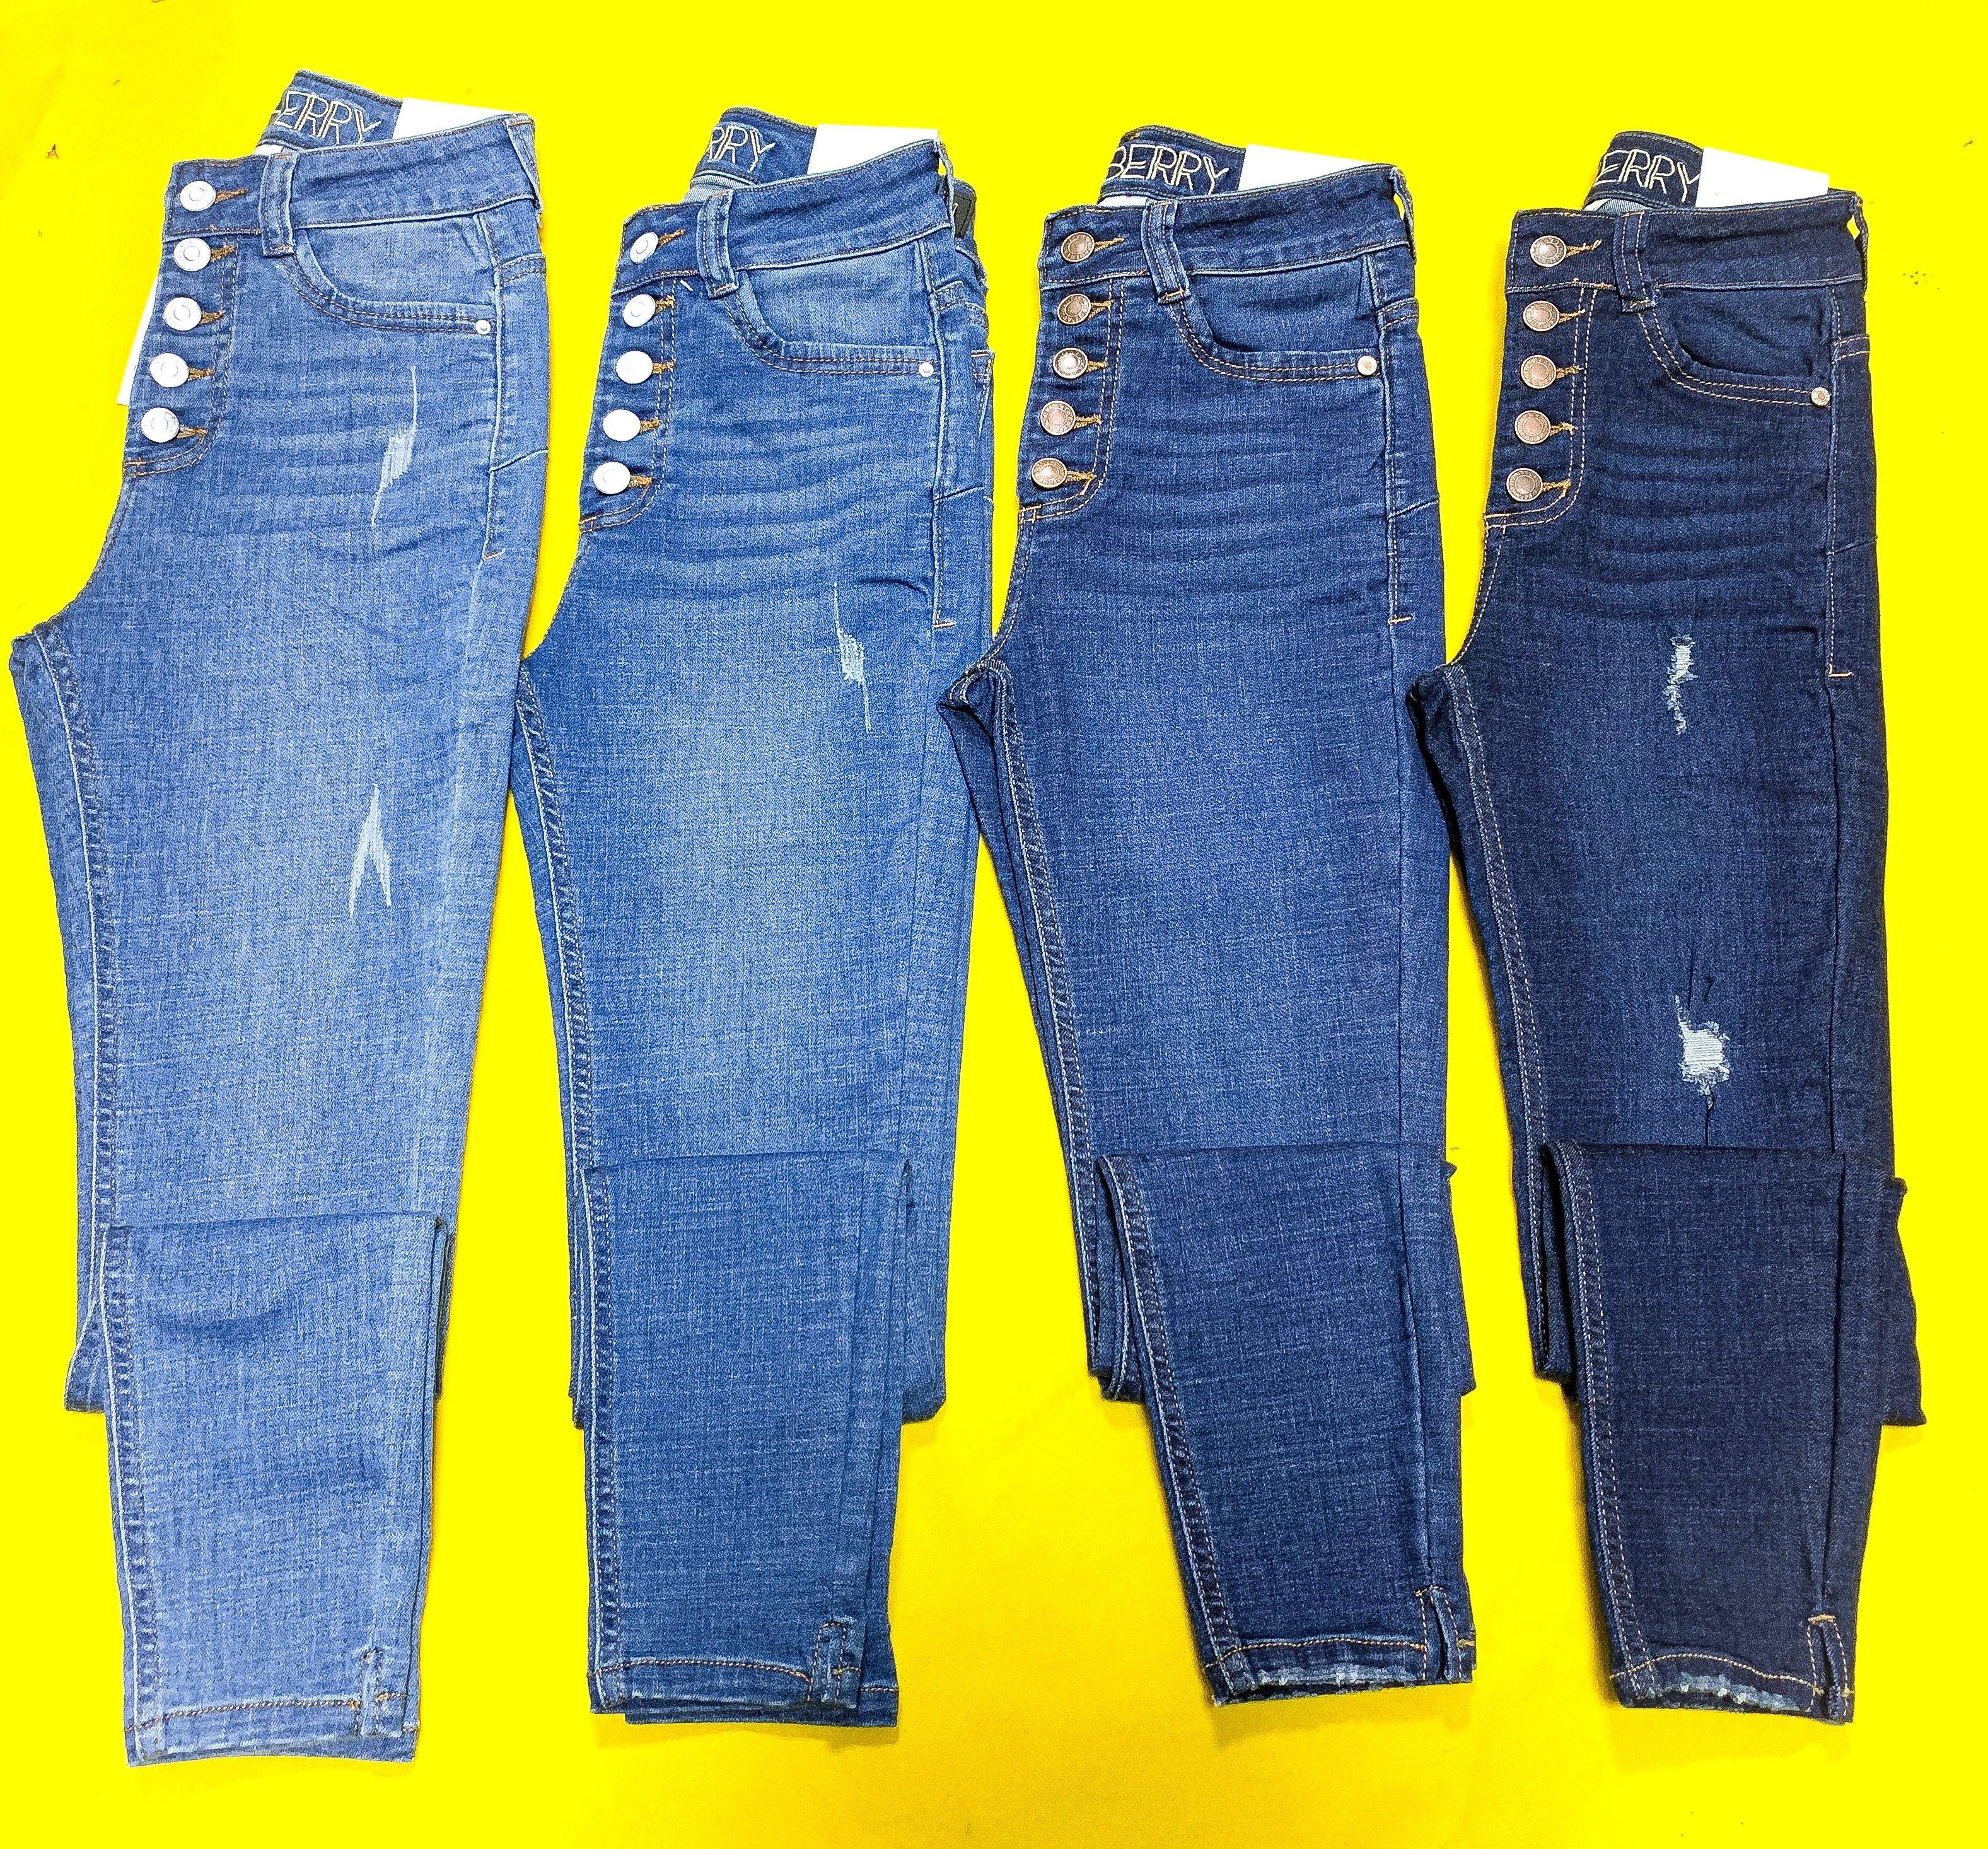 Kamberry 5 Botones Denim Wear How To Wear Mom Jeans